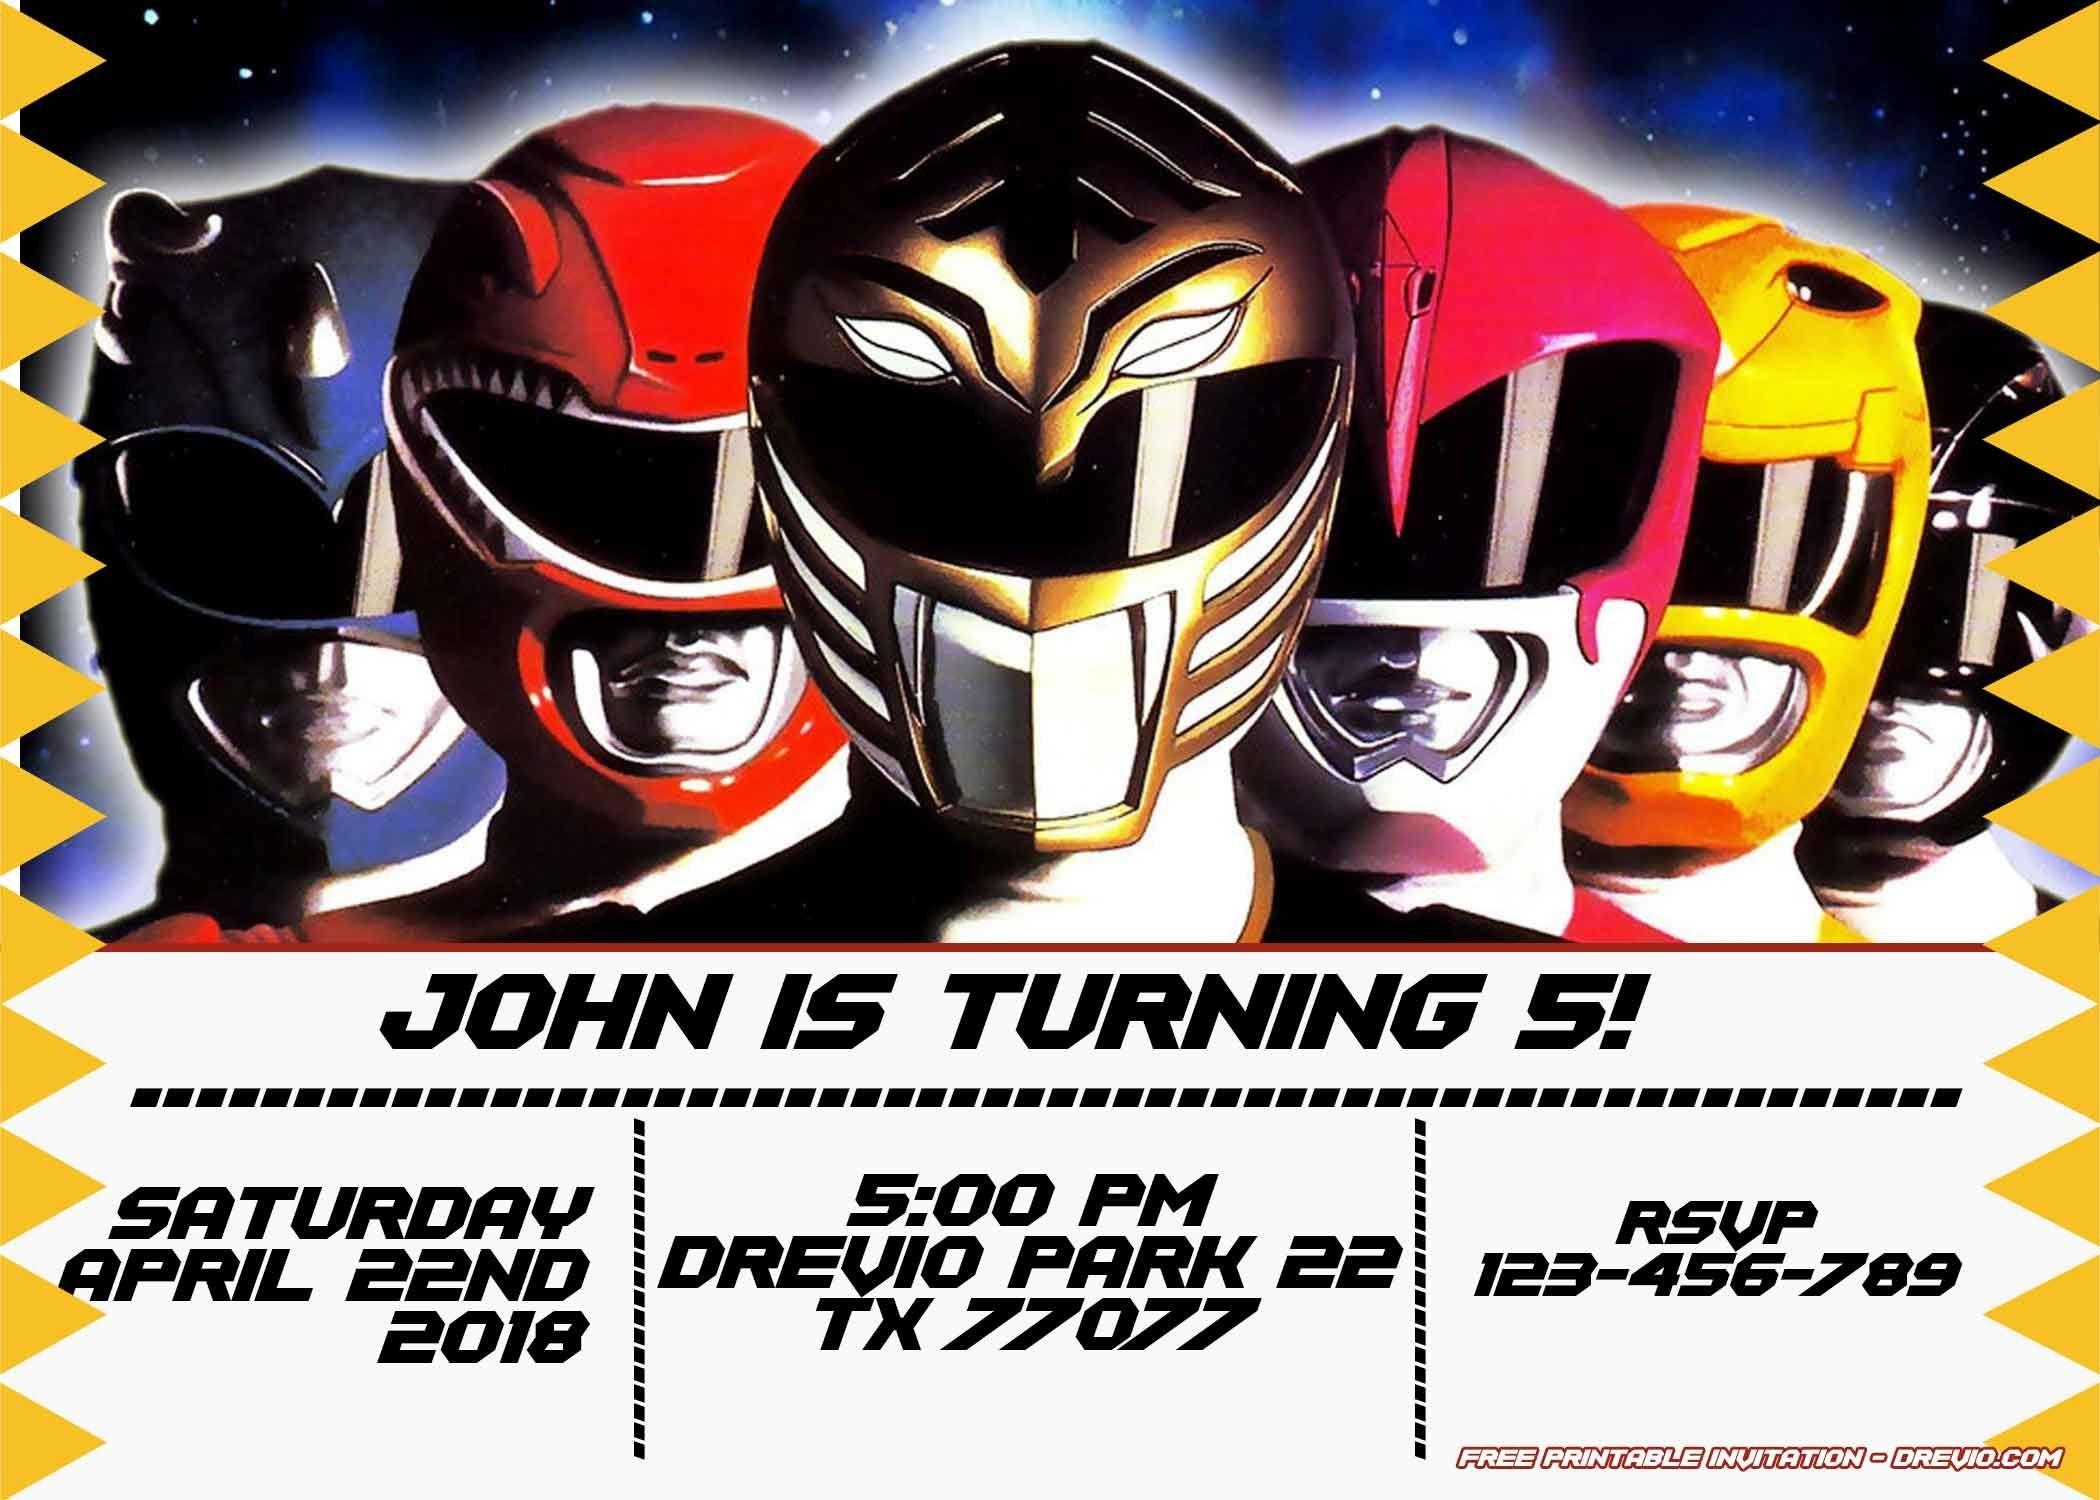 Free Power Rangers Birthday Invitation   Life's A Party   Power - Free Printable Power Ranger Birthday Invitations